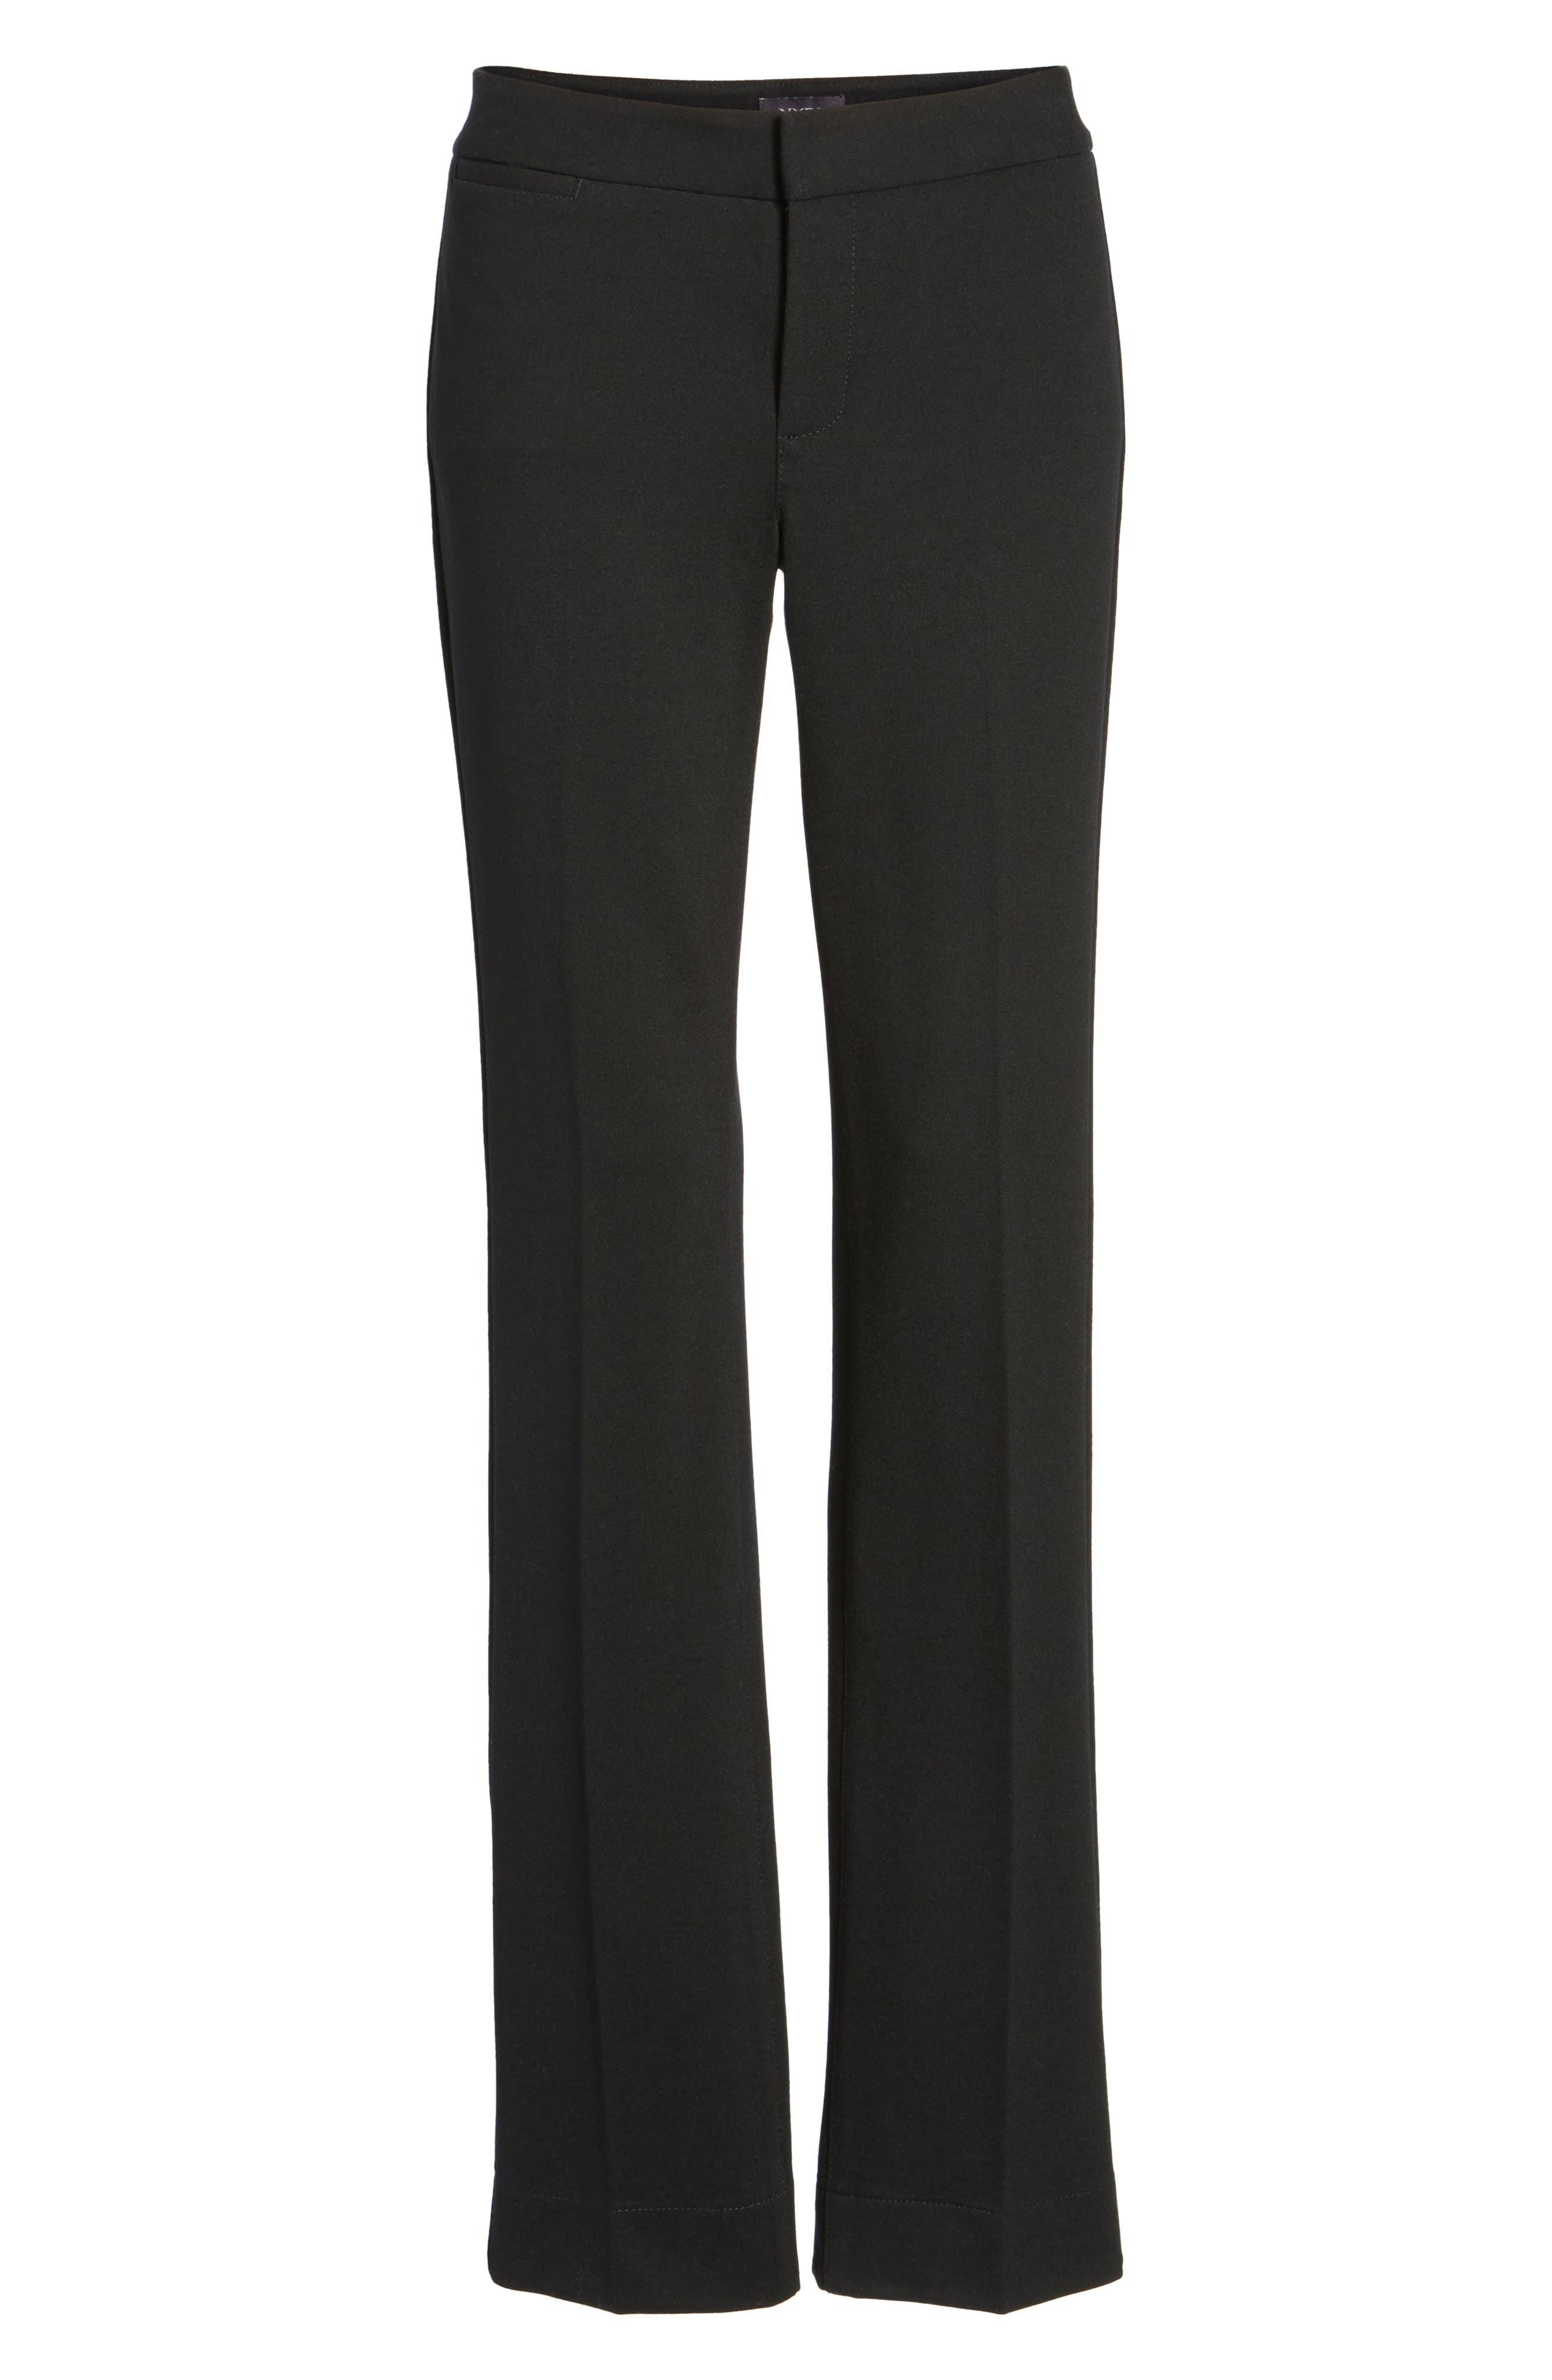 Stretch Knit Trousers,                             Alternate thumbnail 6, color,                             BLACK